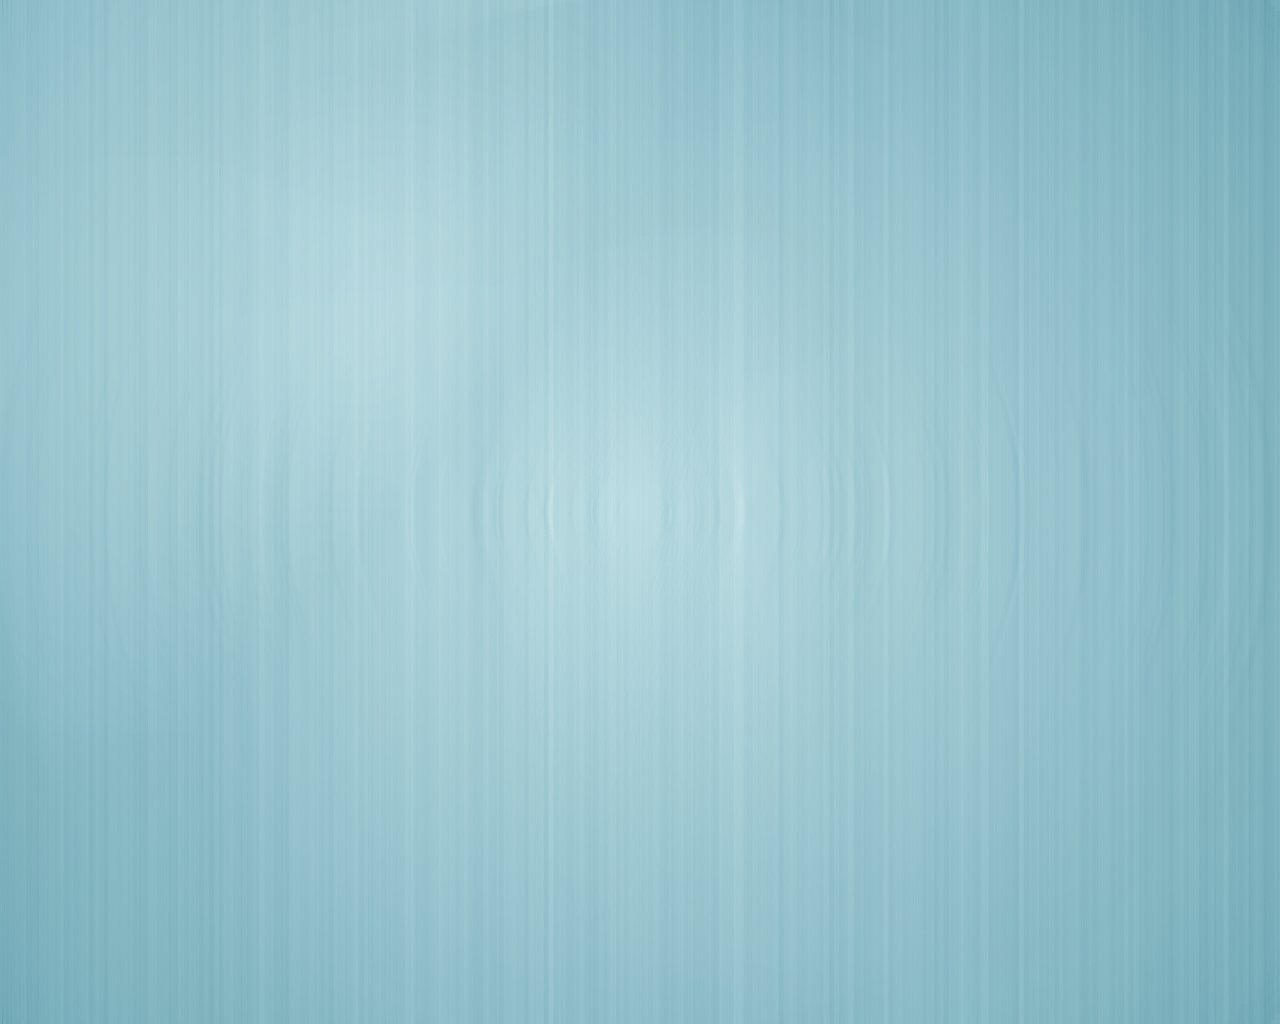 wallpaper stripes blue2 by 10r